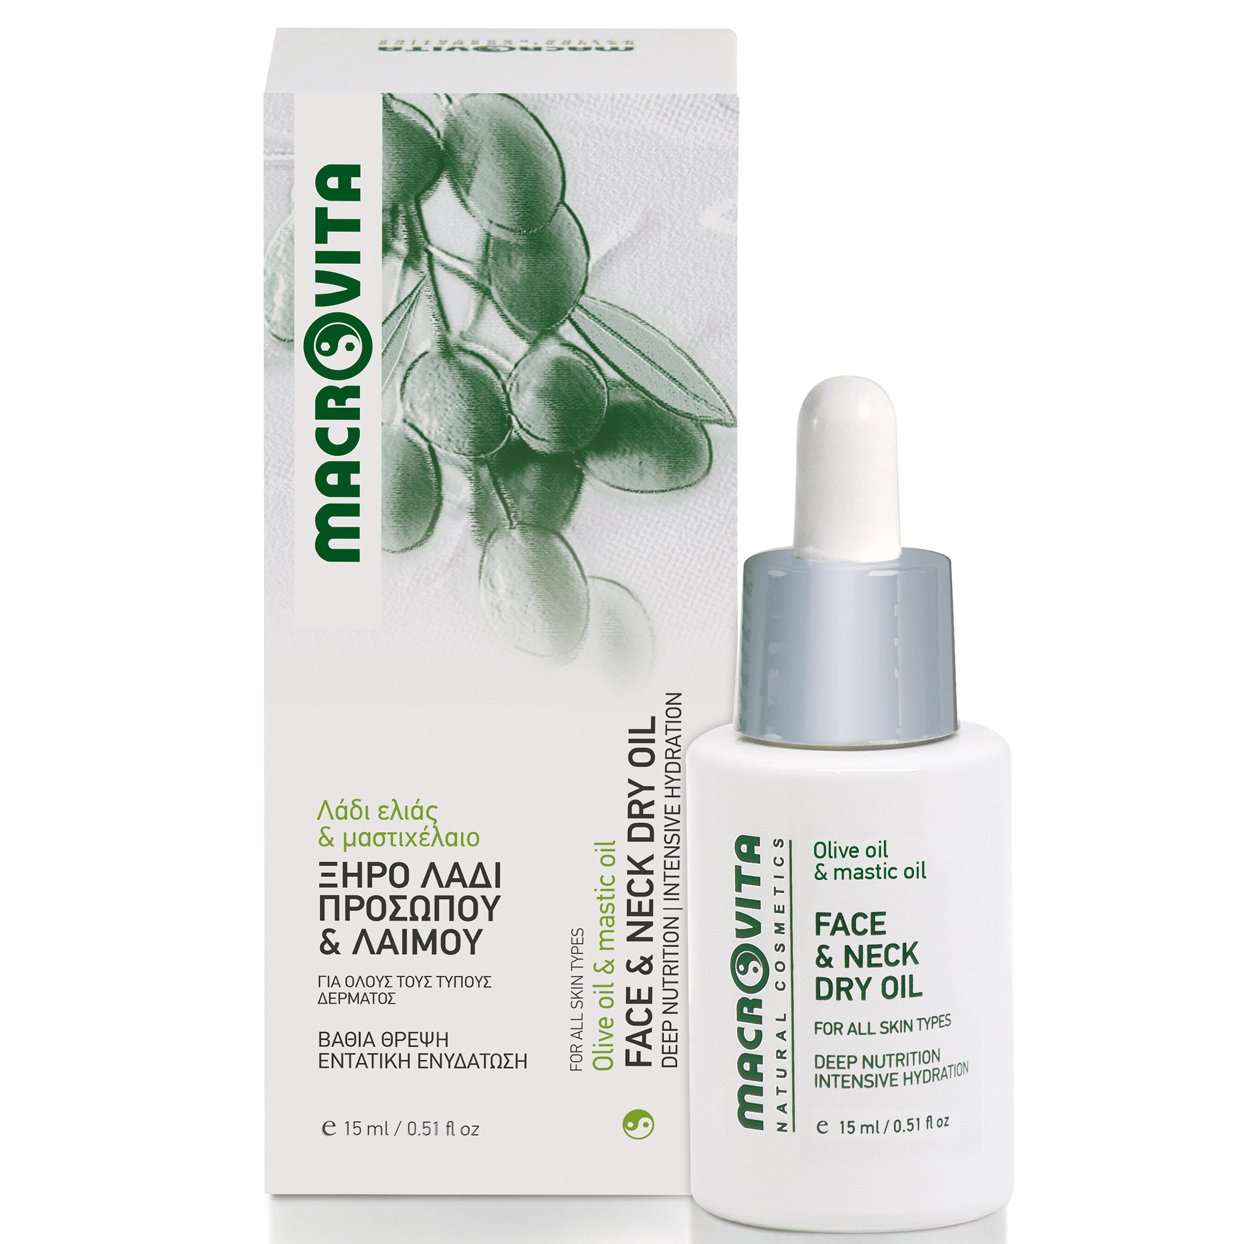 Macrovita Olive Oil & Mastic Oil Face & Neck Dry Oil Ξηρό Λάδι Προσώπου & Λαιμού, Όλοι οι Τύποι Δέρματος 15ml